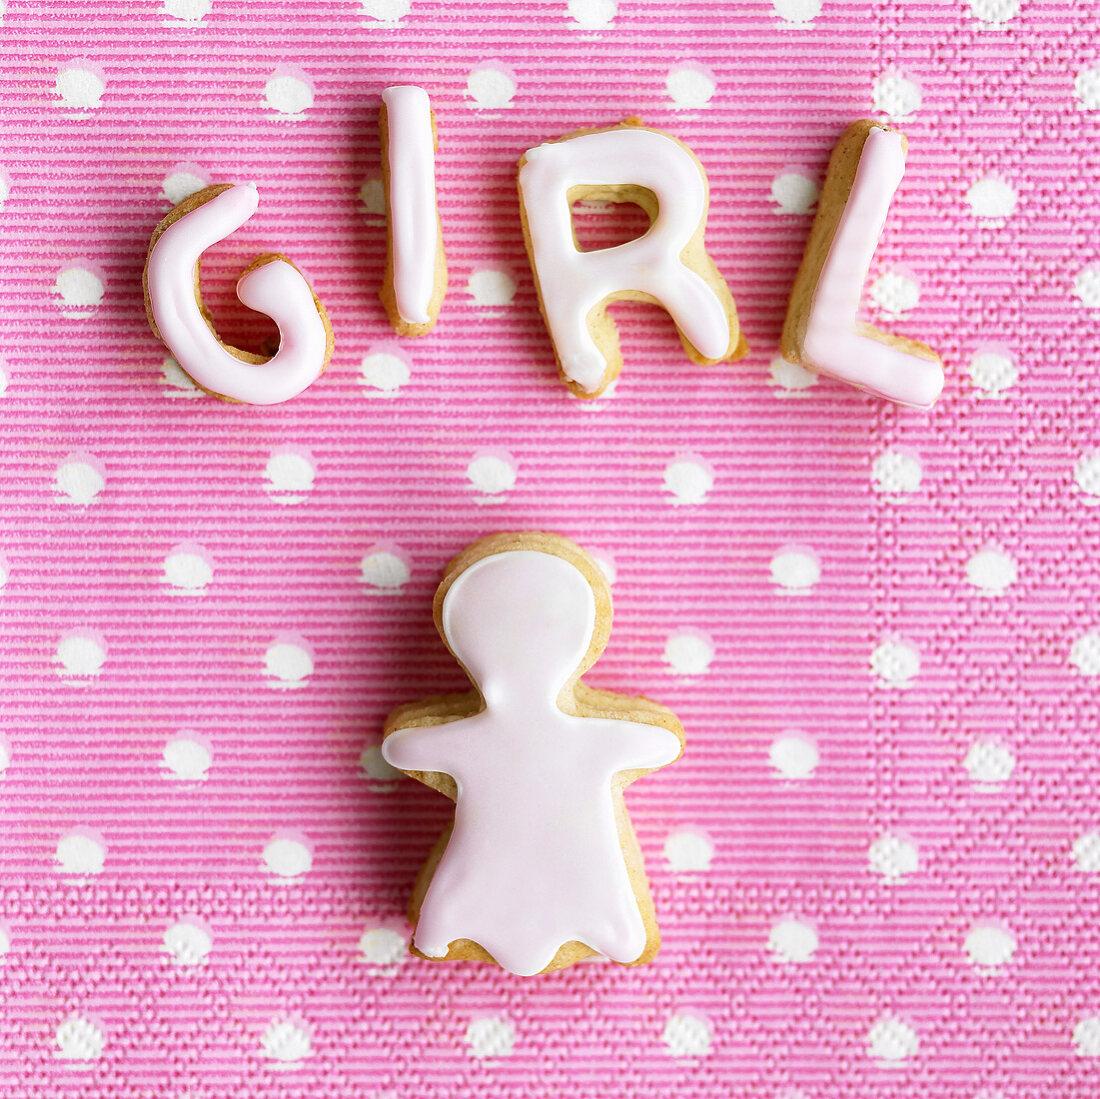 Baked letters spelling 'Girl' and girl figure on napkin